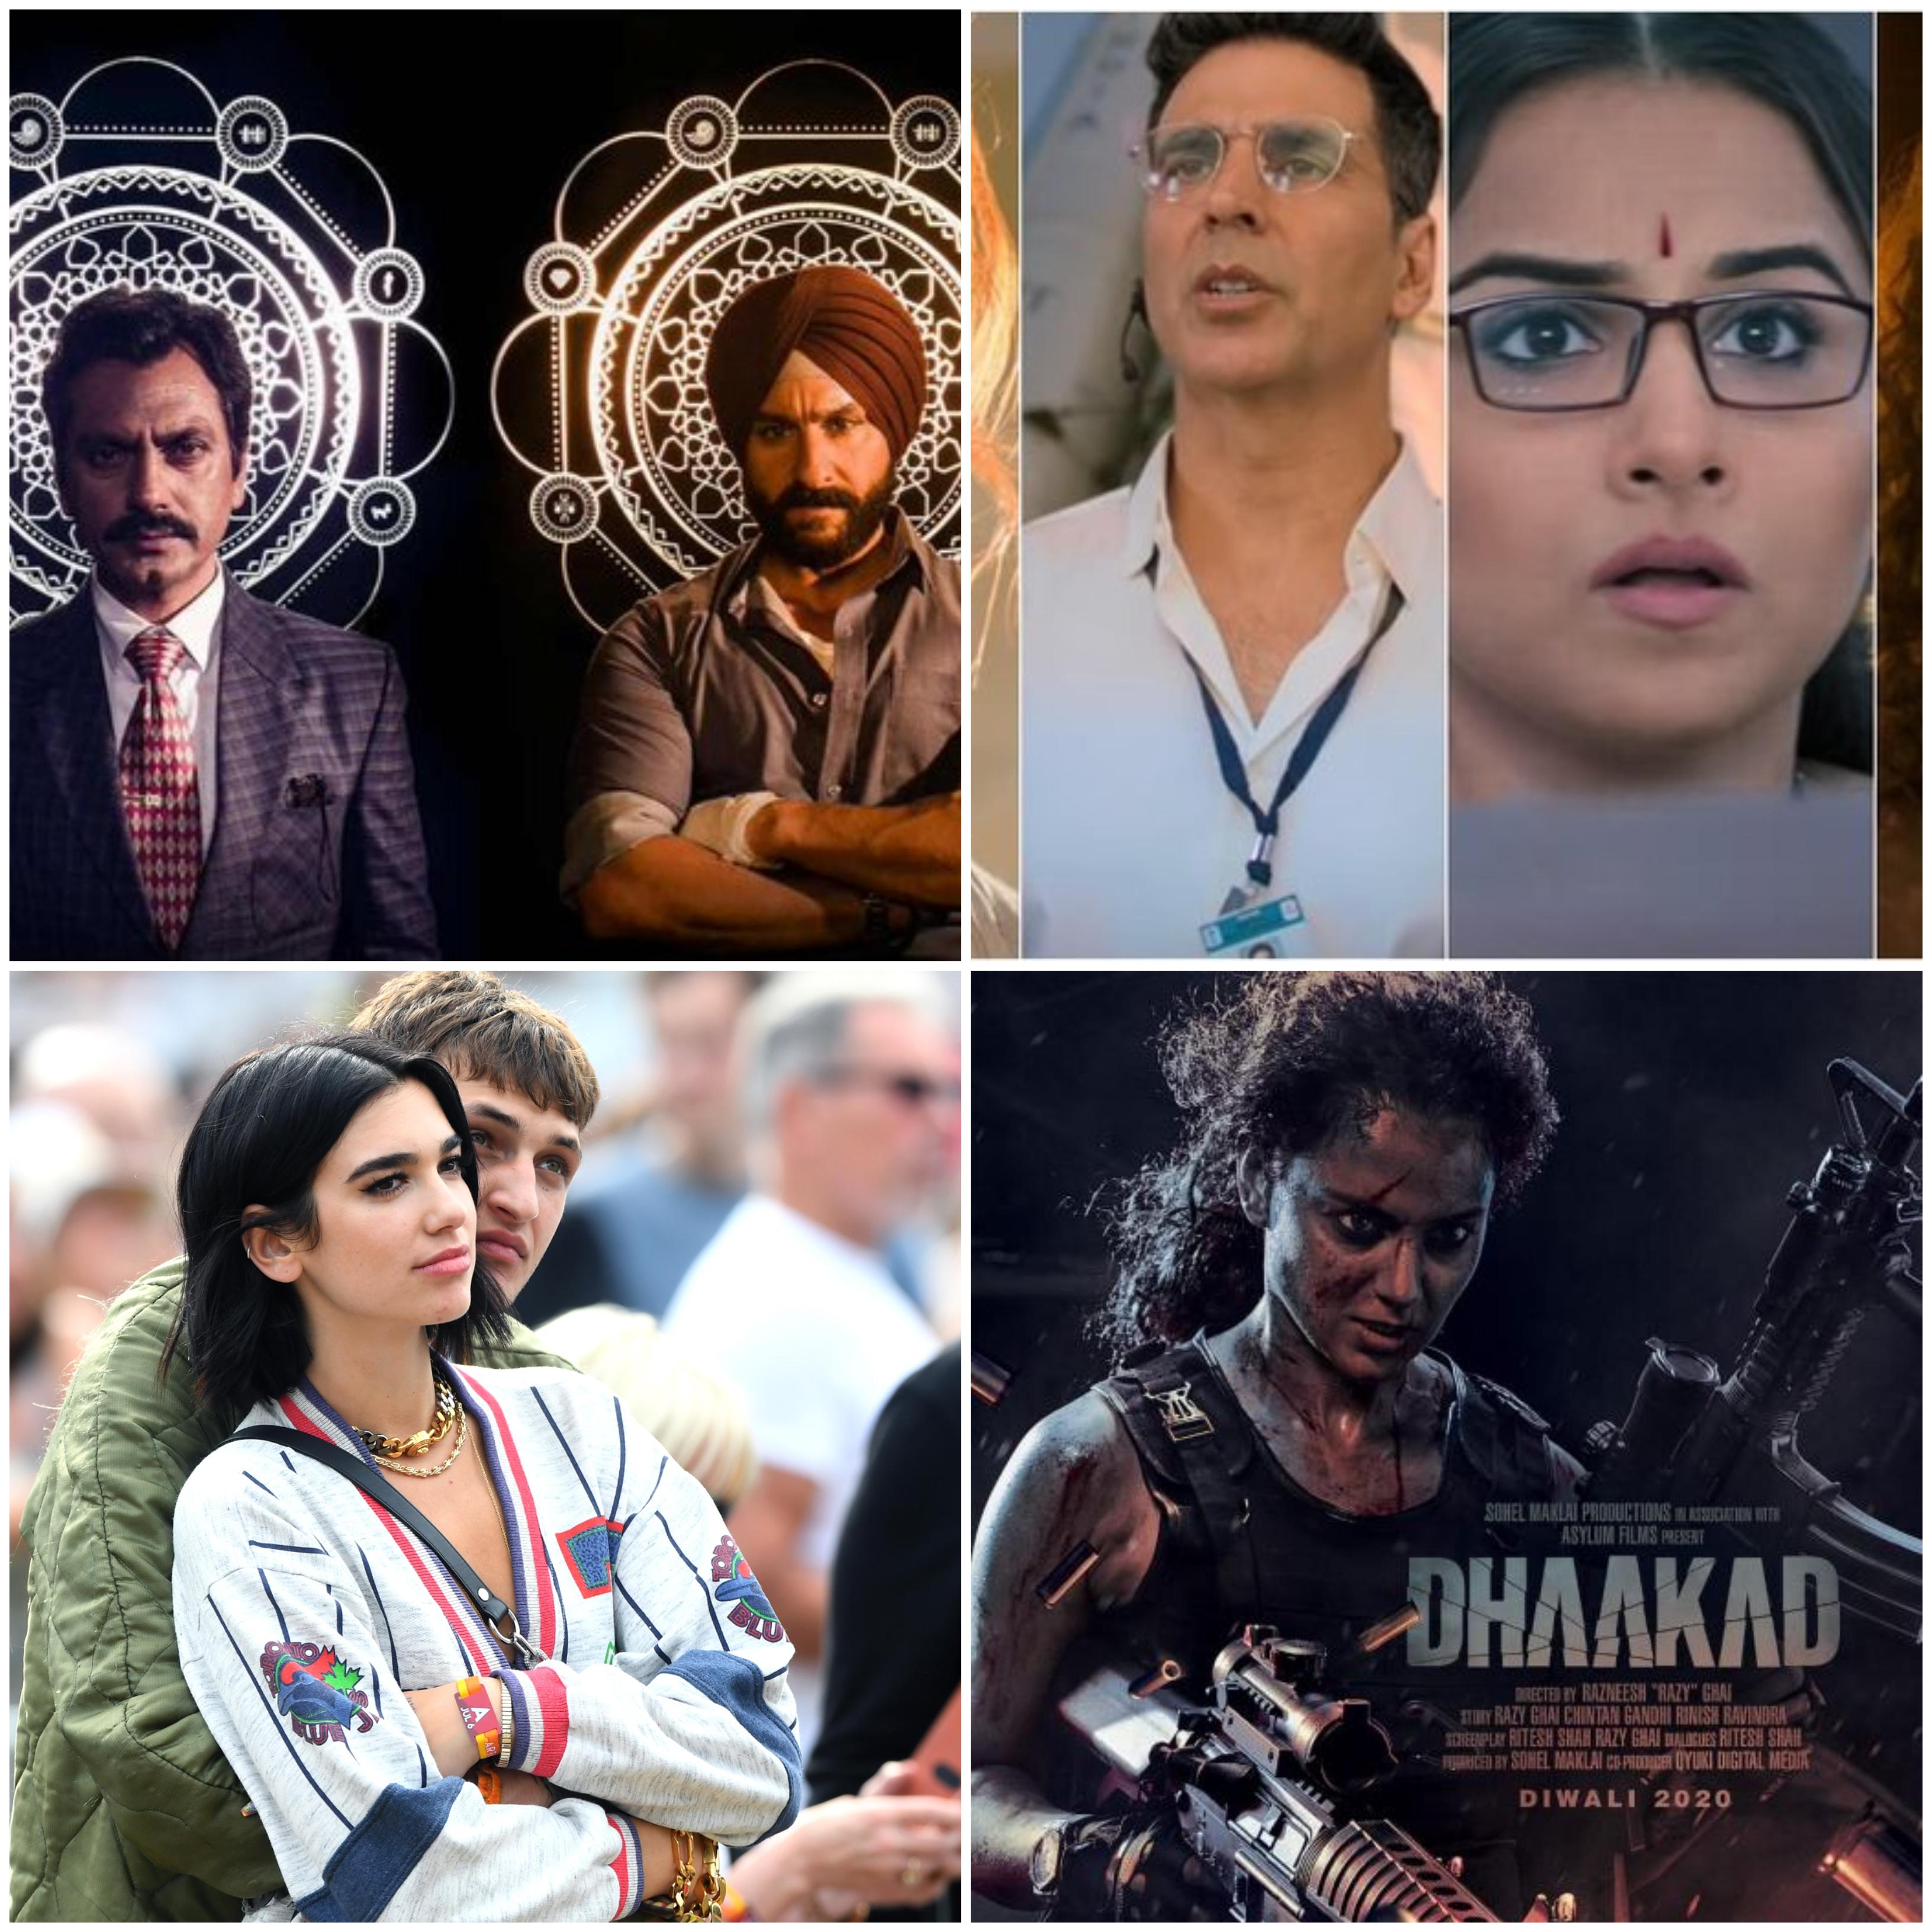 Celebrity, hollywood, bollywood, NewsMobile, NewsMobileIndia